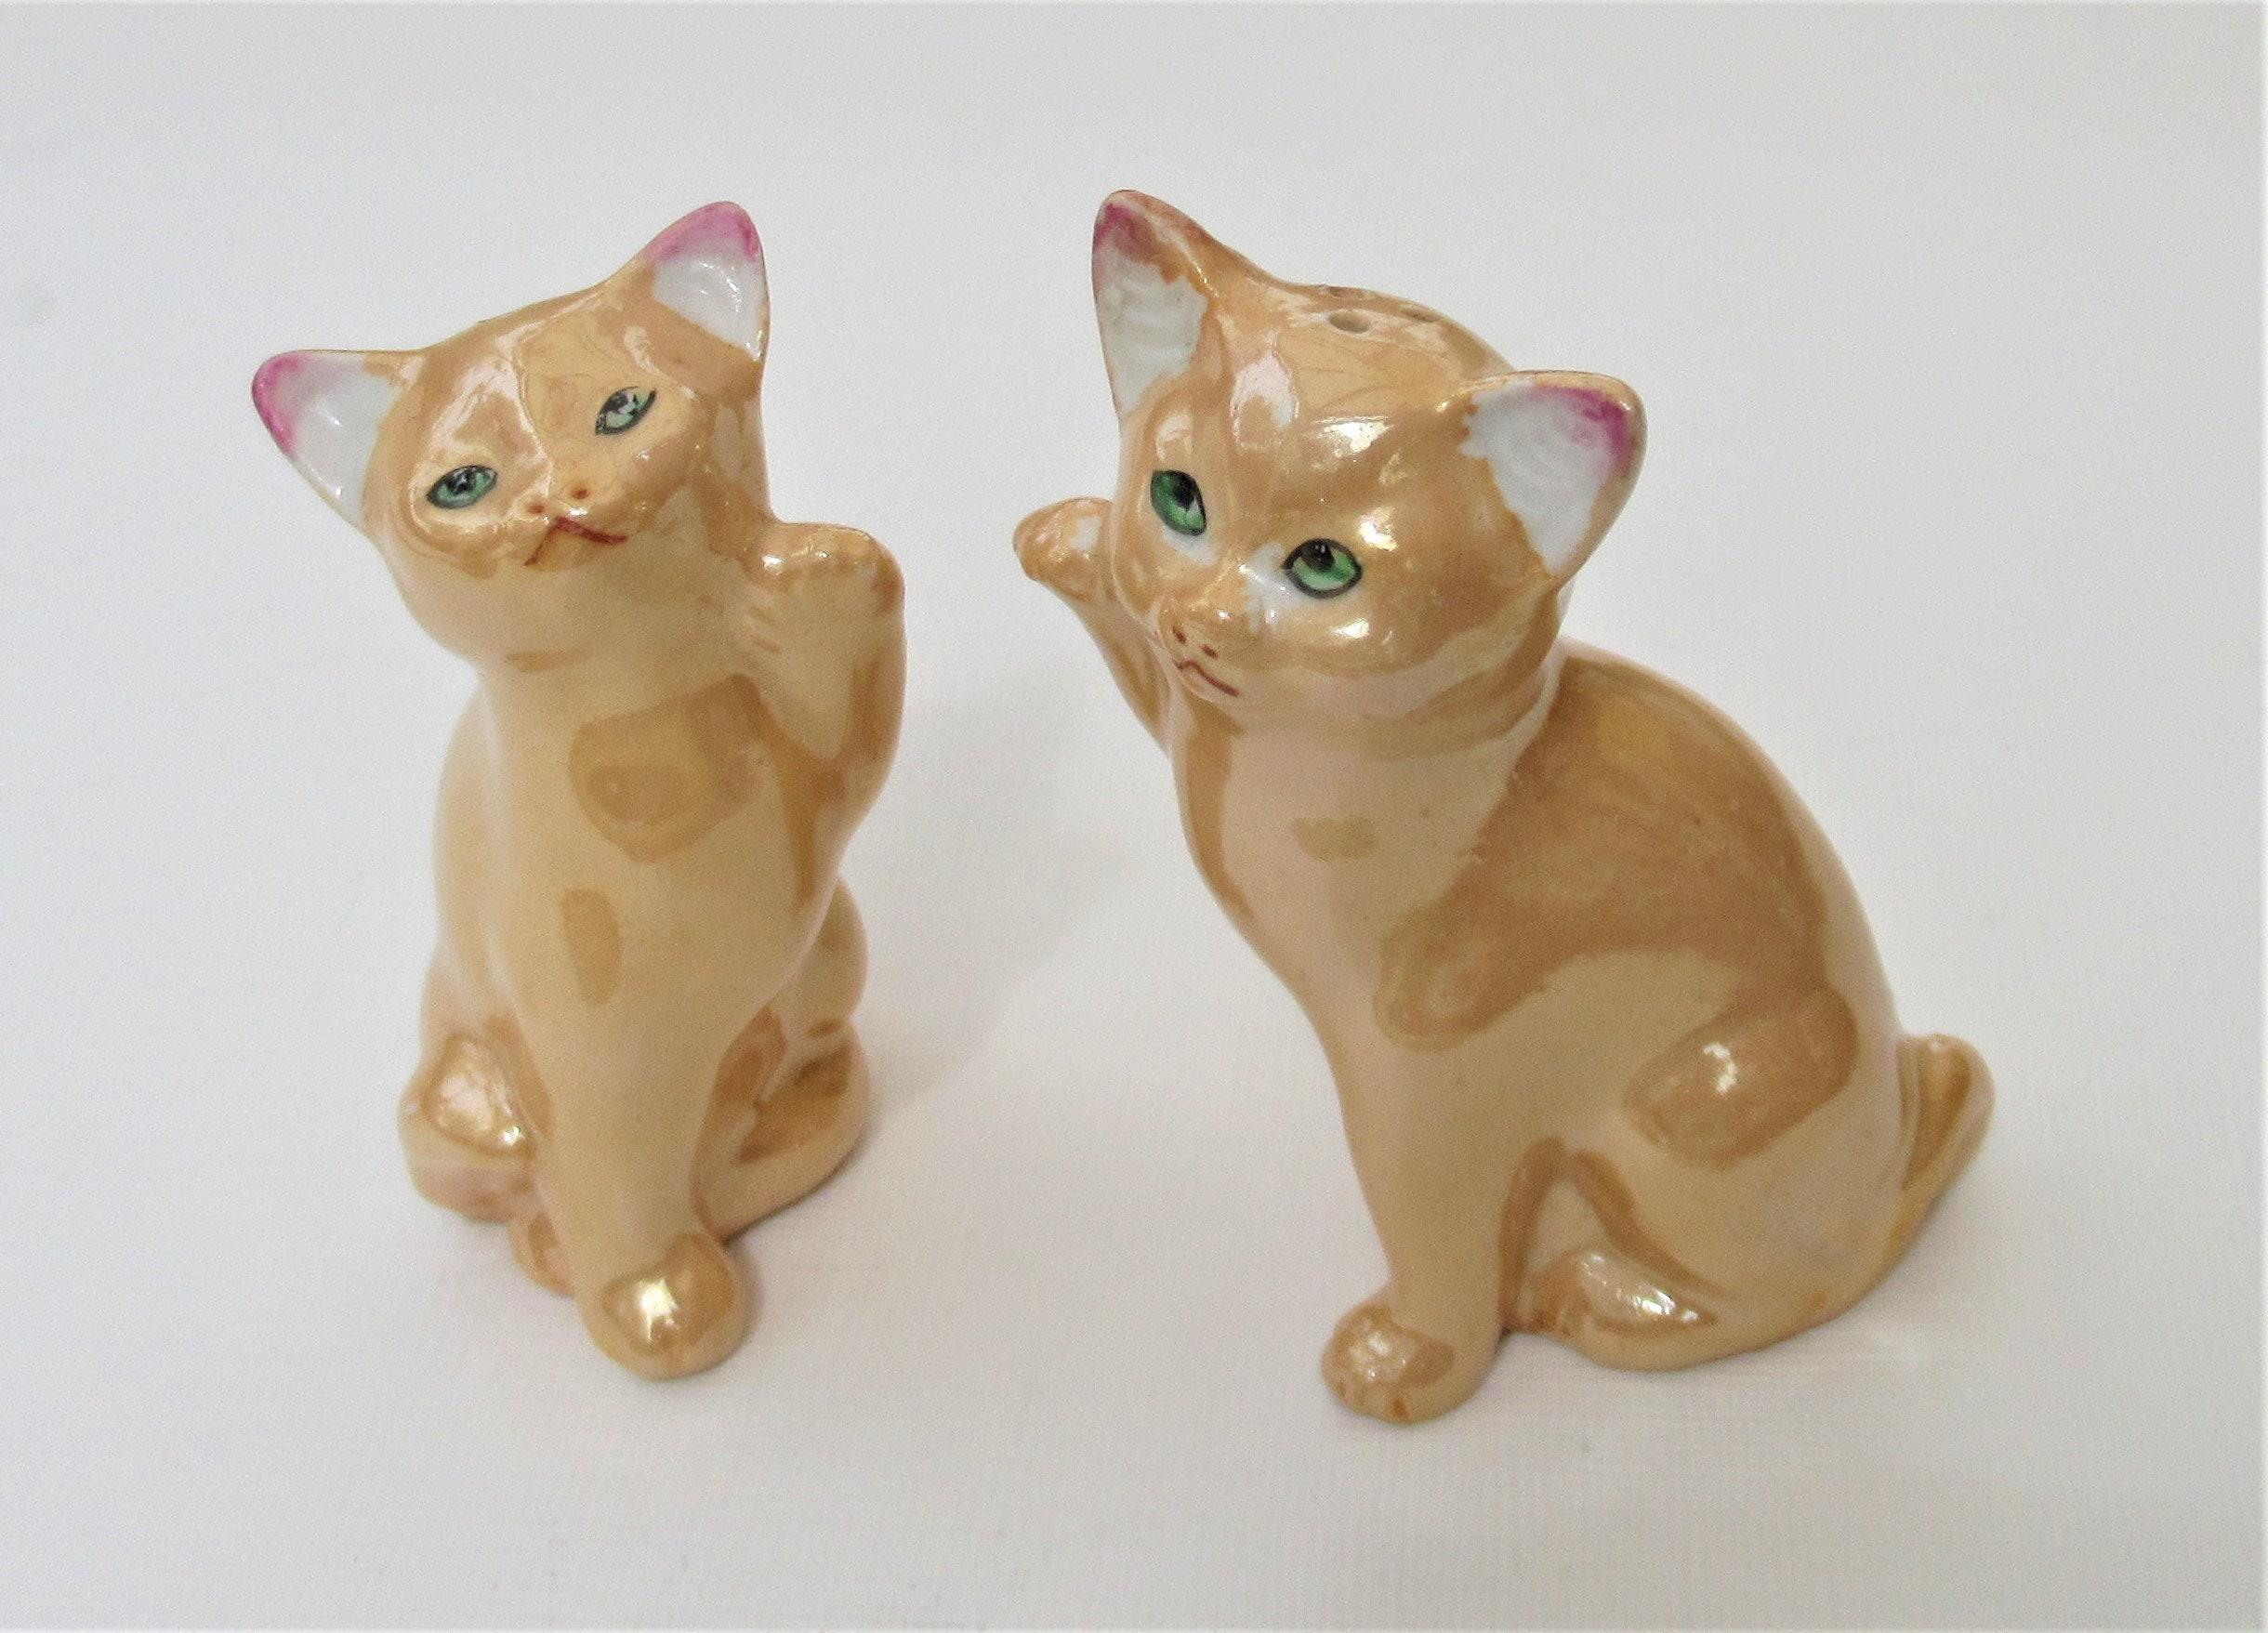 Cat Salt Pepper Shakers Peach Lustre Glaze Vintage Cute Kitsch Etsy